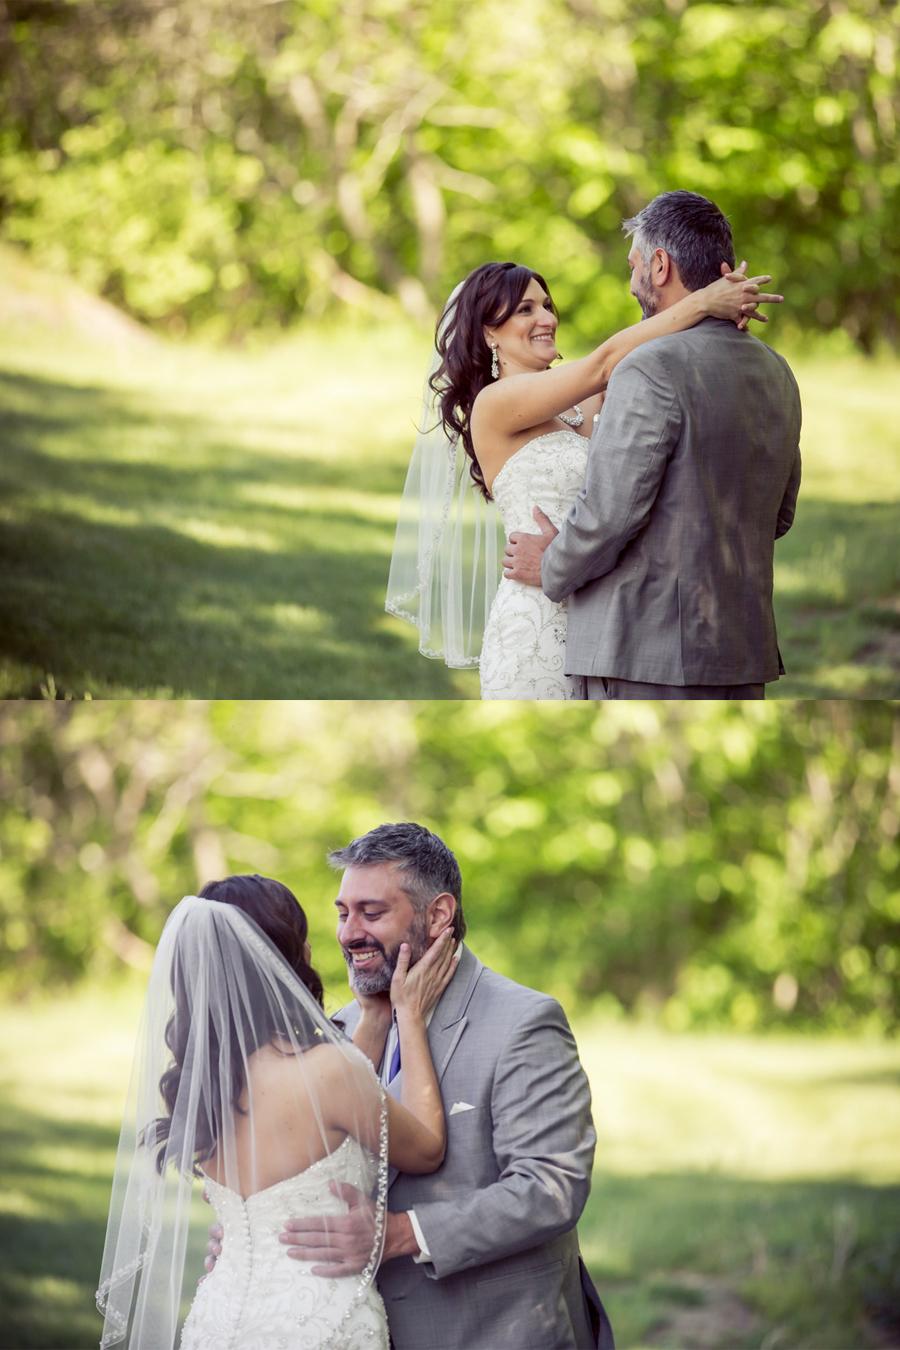 NEPA_Pocono_Weddings_Rob_Lettieri_Photography_05.jpg